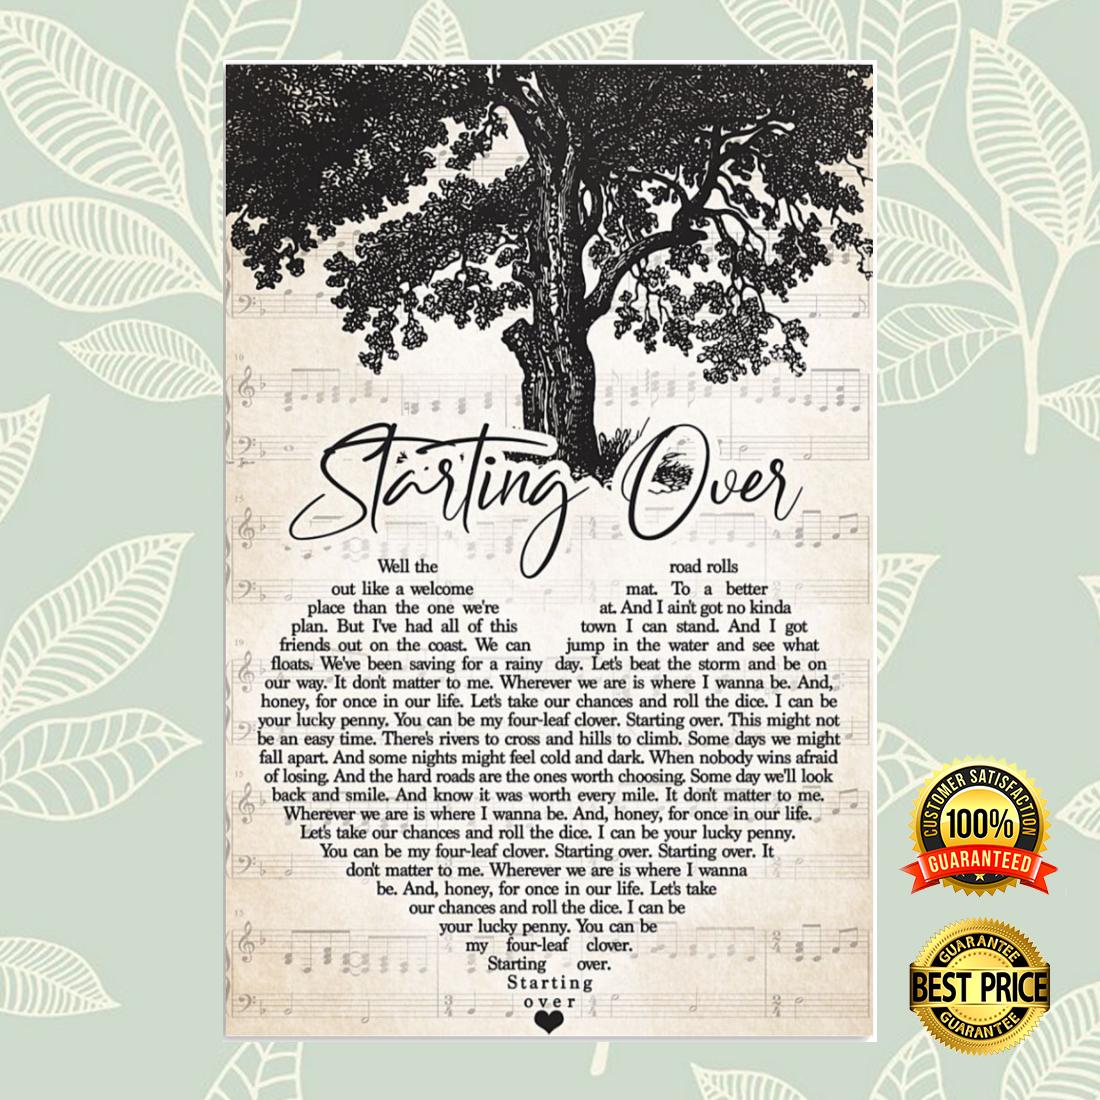 Starting over heart song lyric poster 5